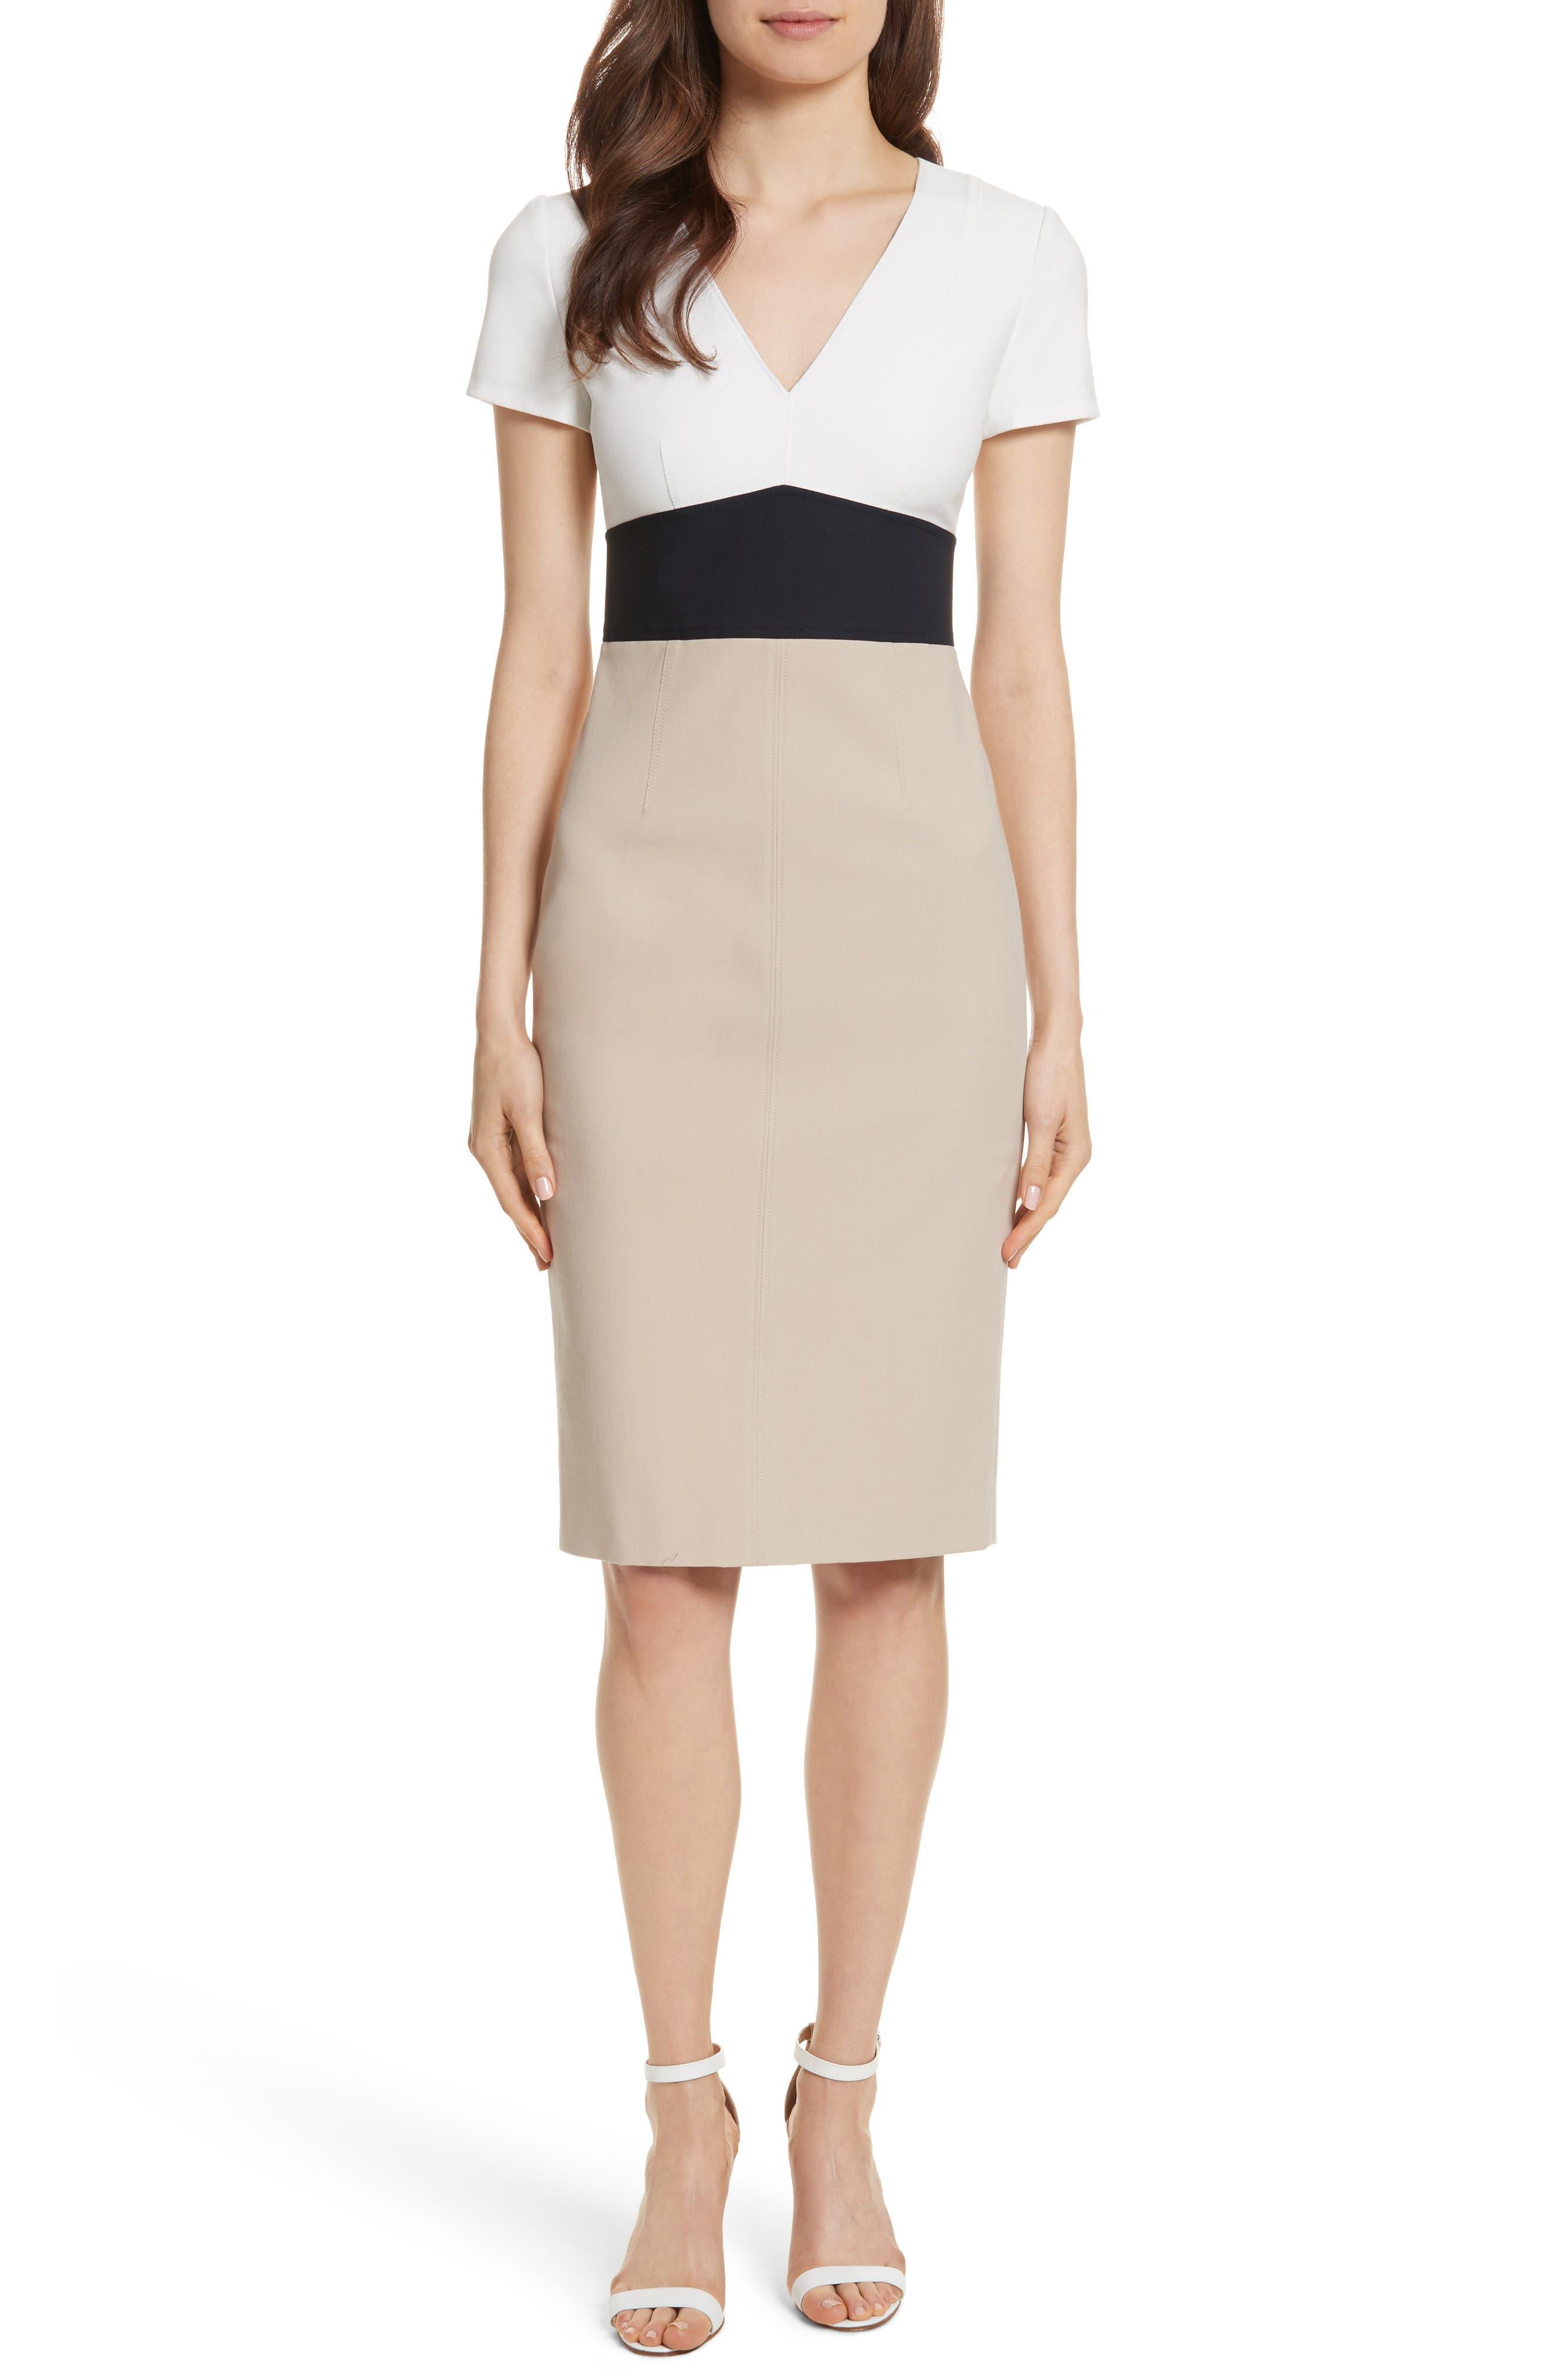 Diane von Furstenberg Colorblock Stretch Cotton Blend Sheath Dress,                             Main thumbnail 1, color,                             Sand/ Alexander Navy/ White